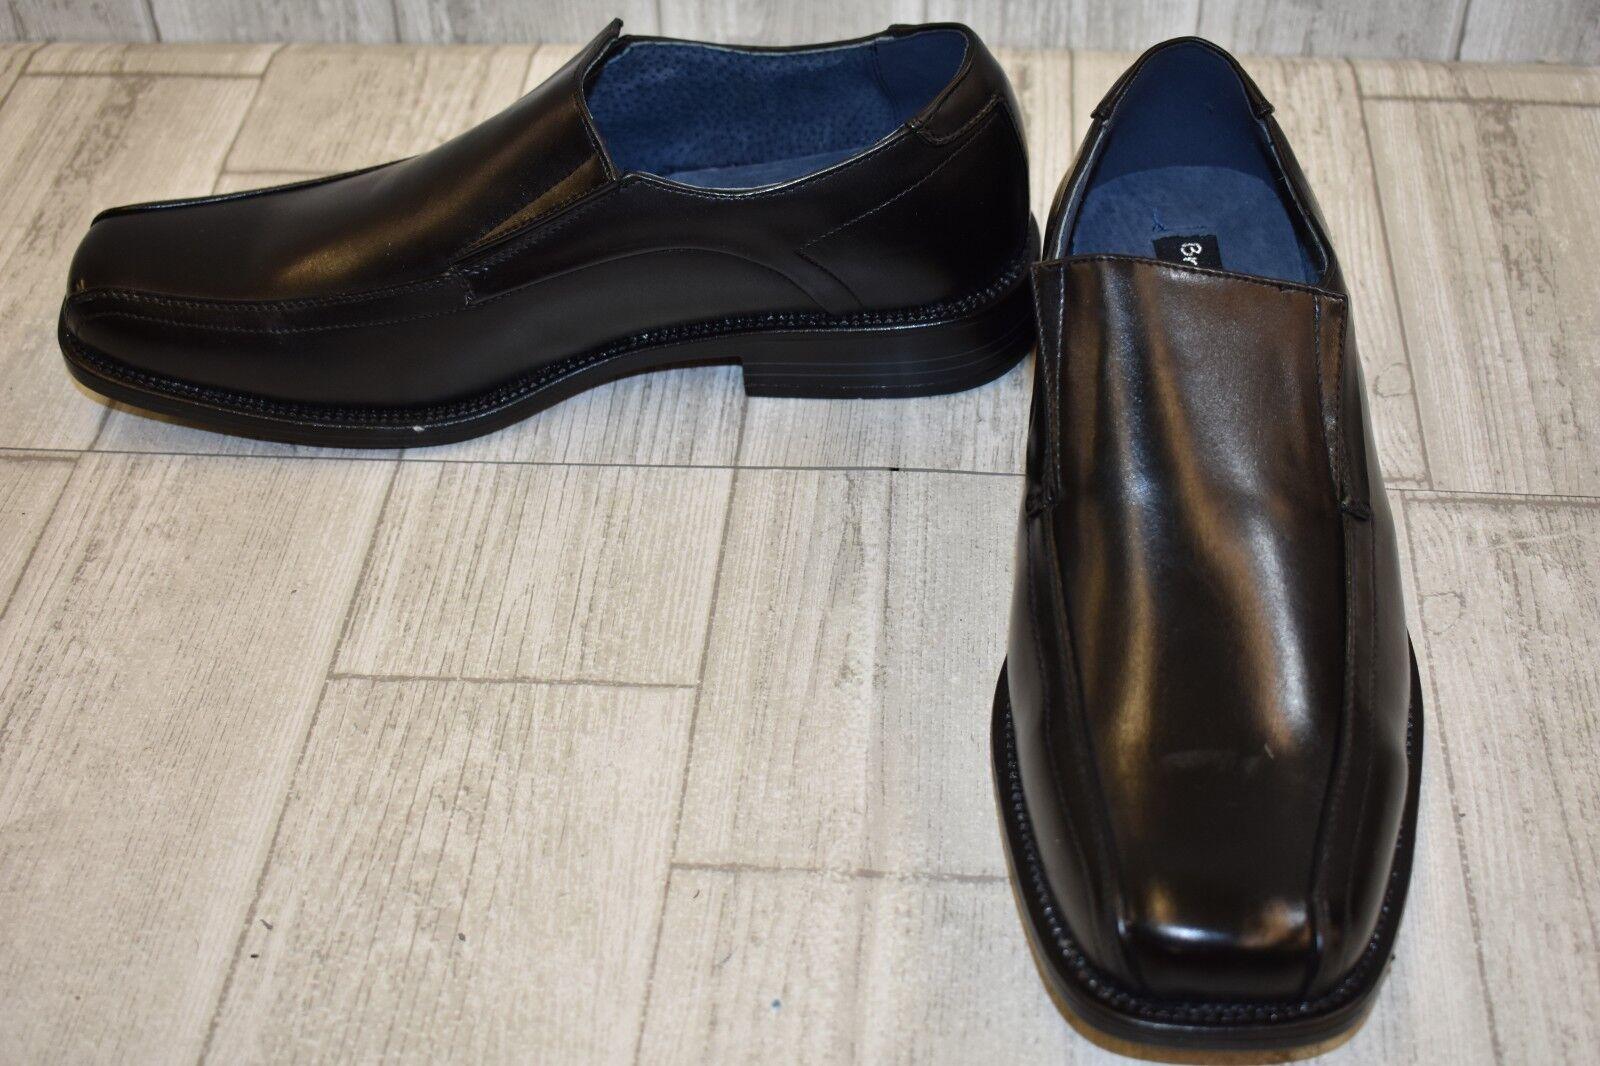 Bruno Marc State 01 Loafers - Men's Size 11 - Black